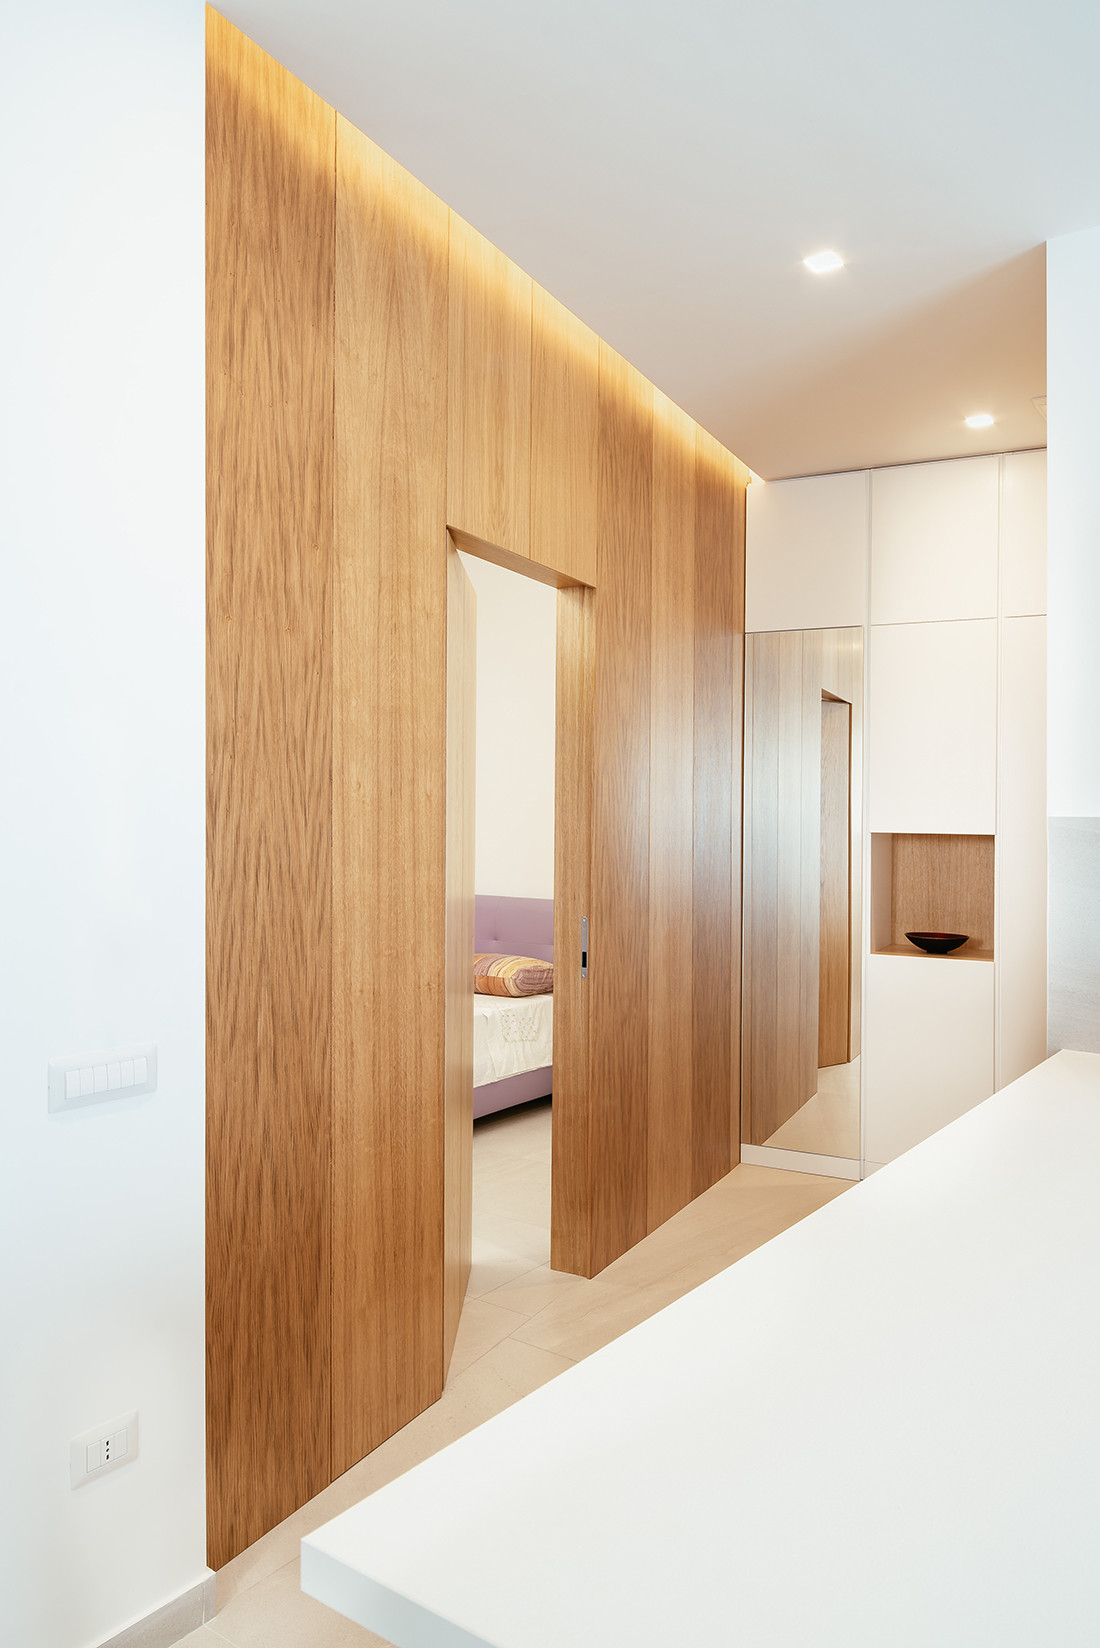 Casa Ci_Ro. manuarino architettura